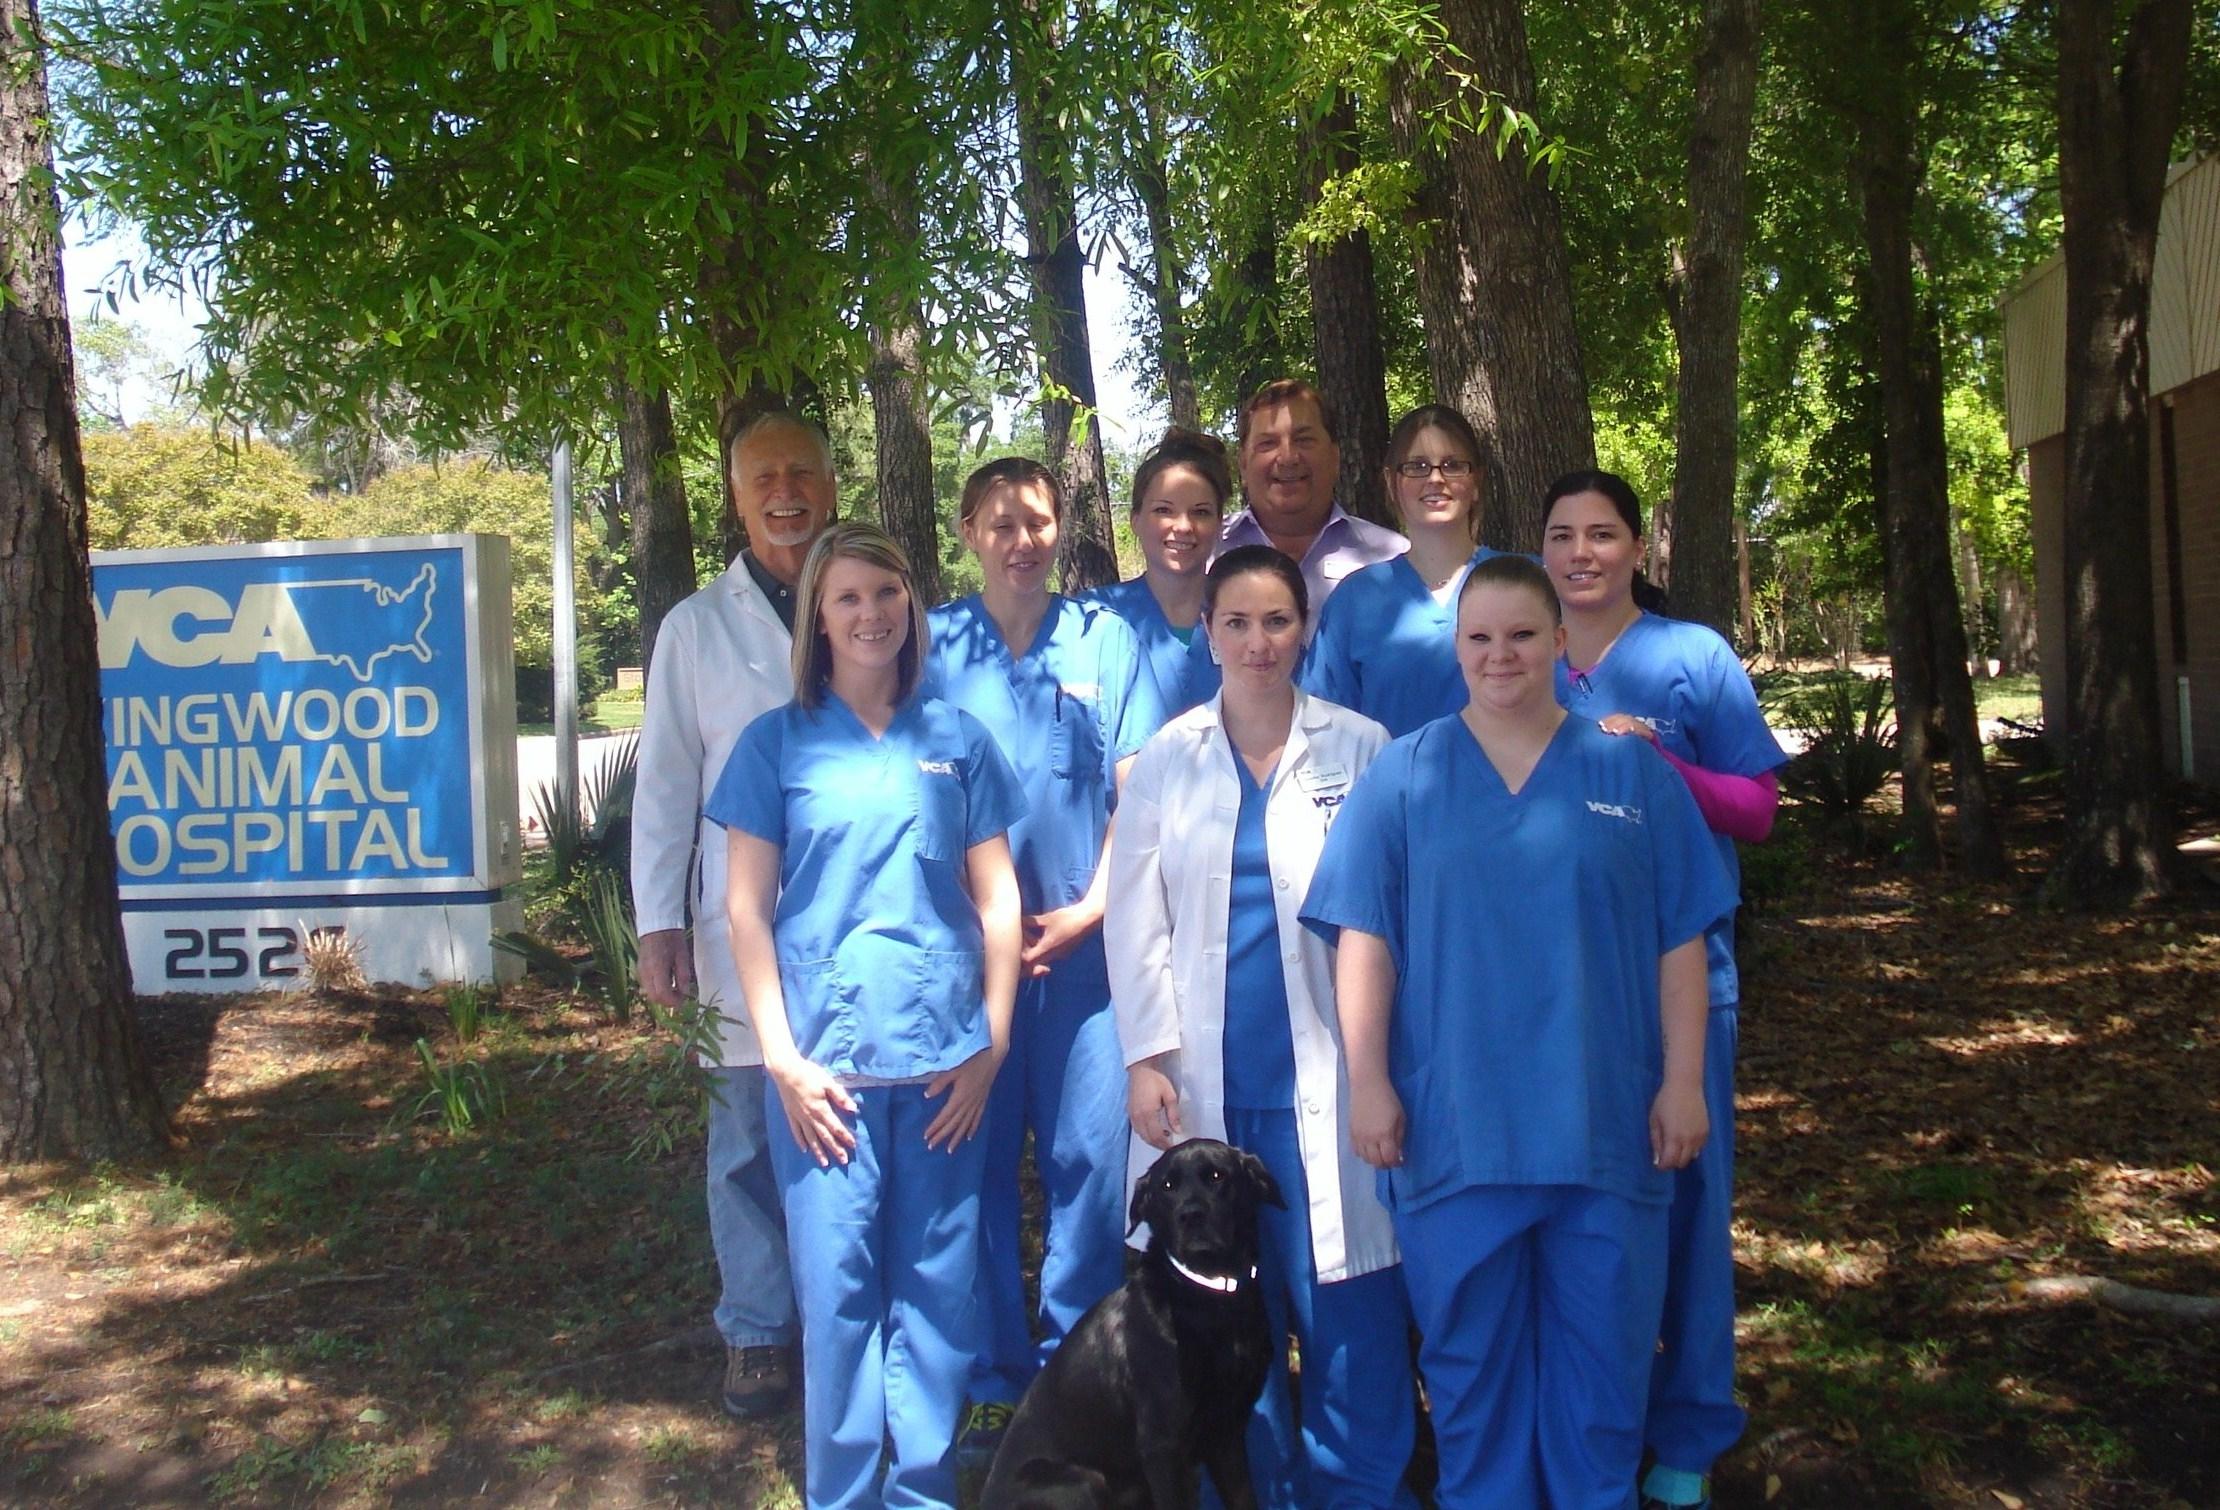 VCA Kingwood Animal Hospital Coupons near me in Kingwood ...